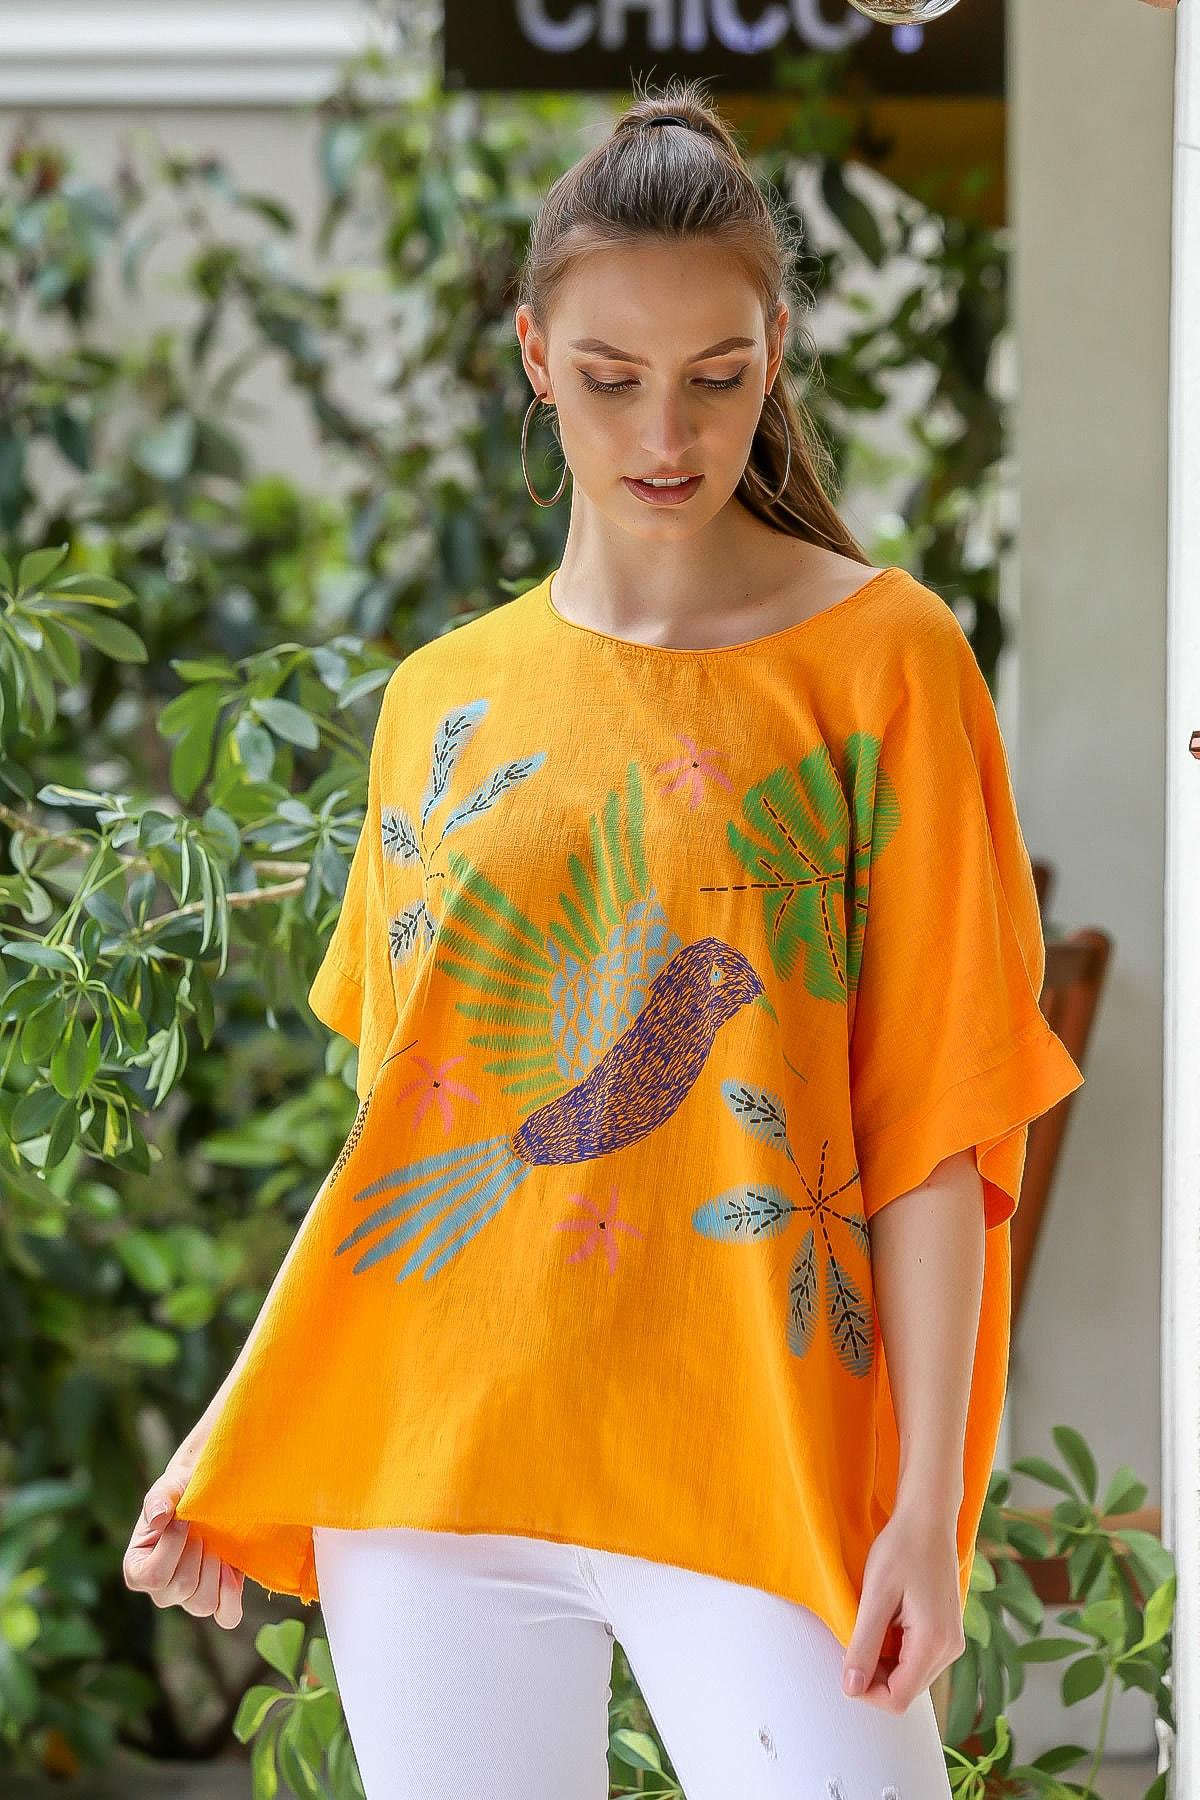 Chiccy Kadın Turuncu  Sıfır Yaka Yalı Çapkını Kuş Desenli Salaş Dokuma Bluz M10010200BL95418 3